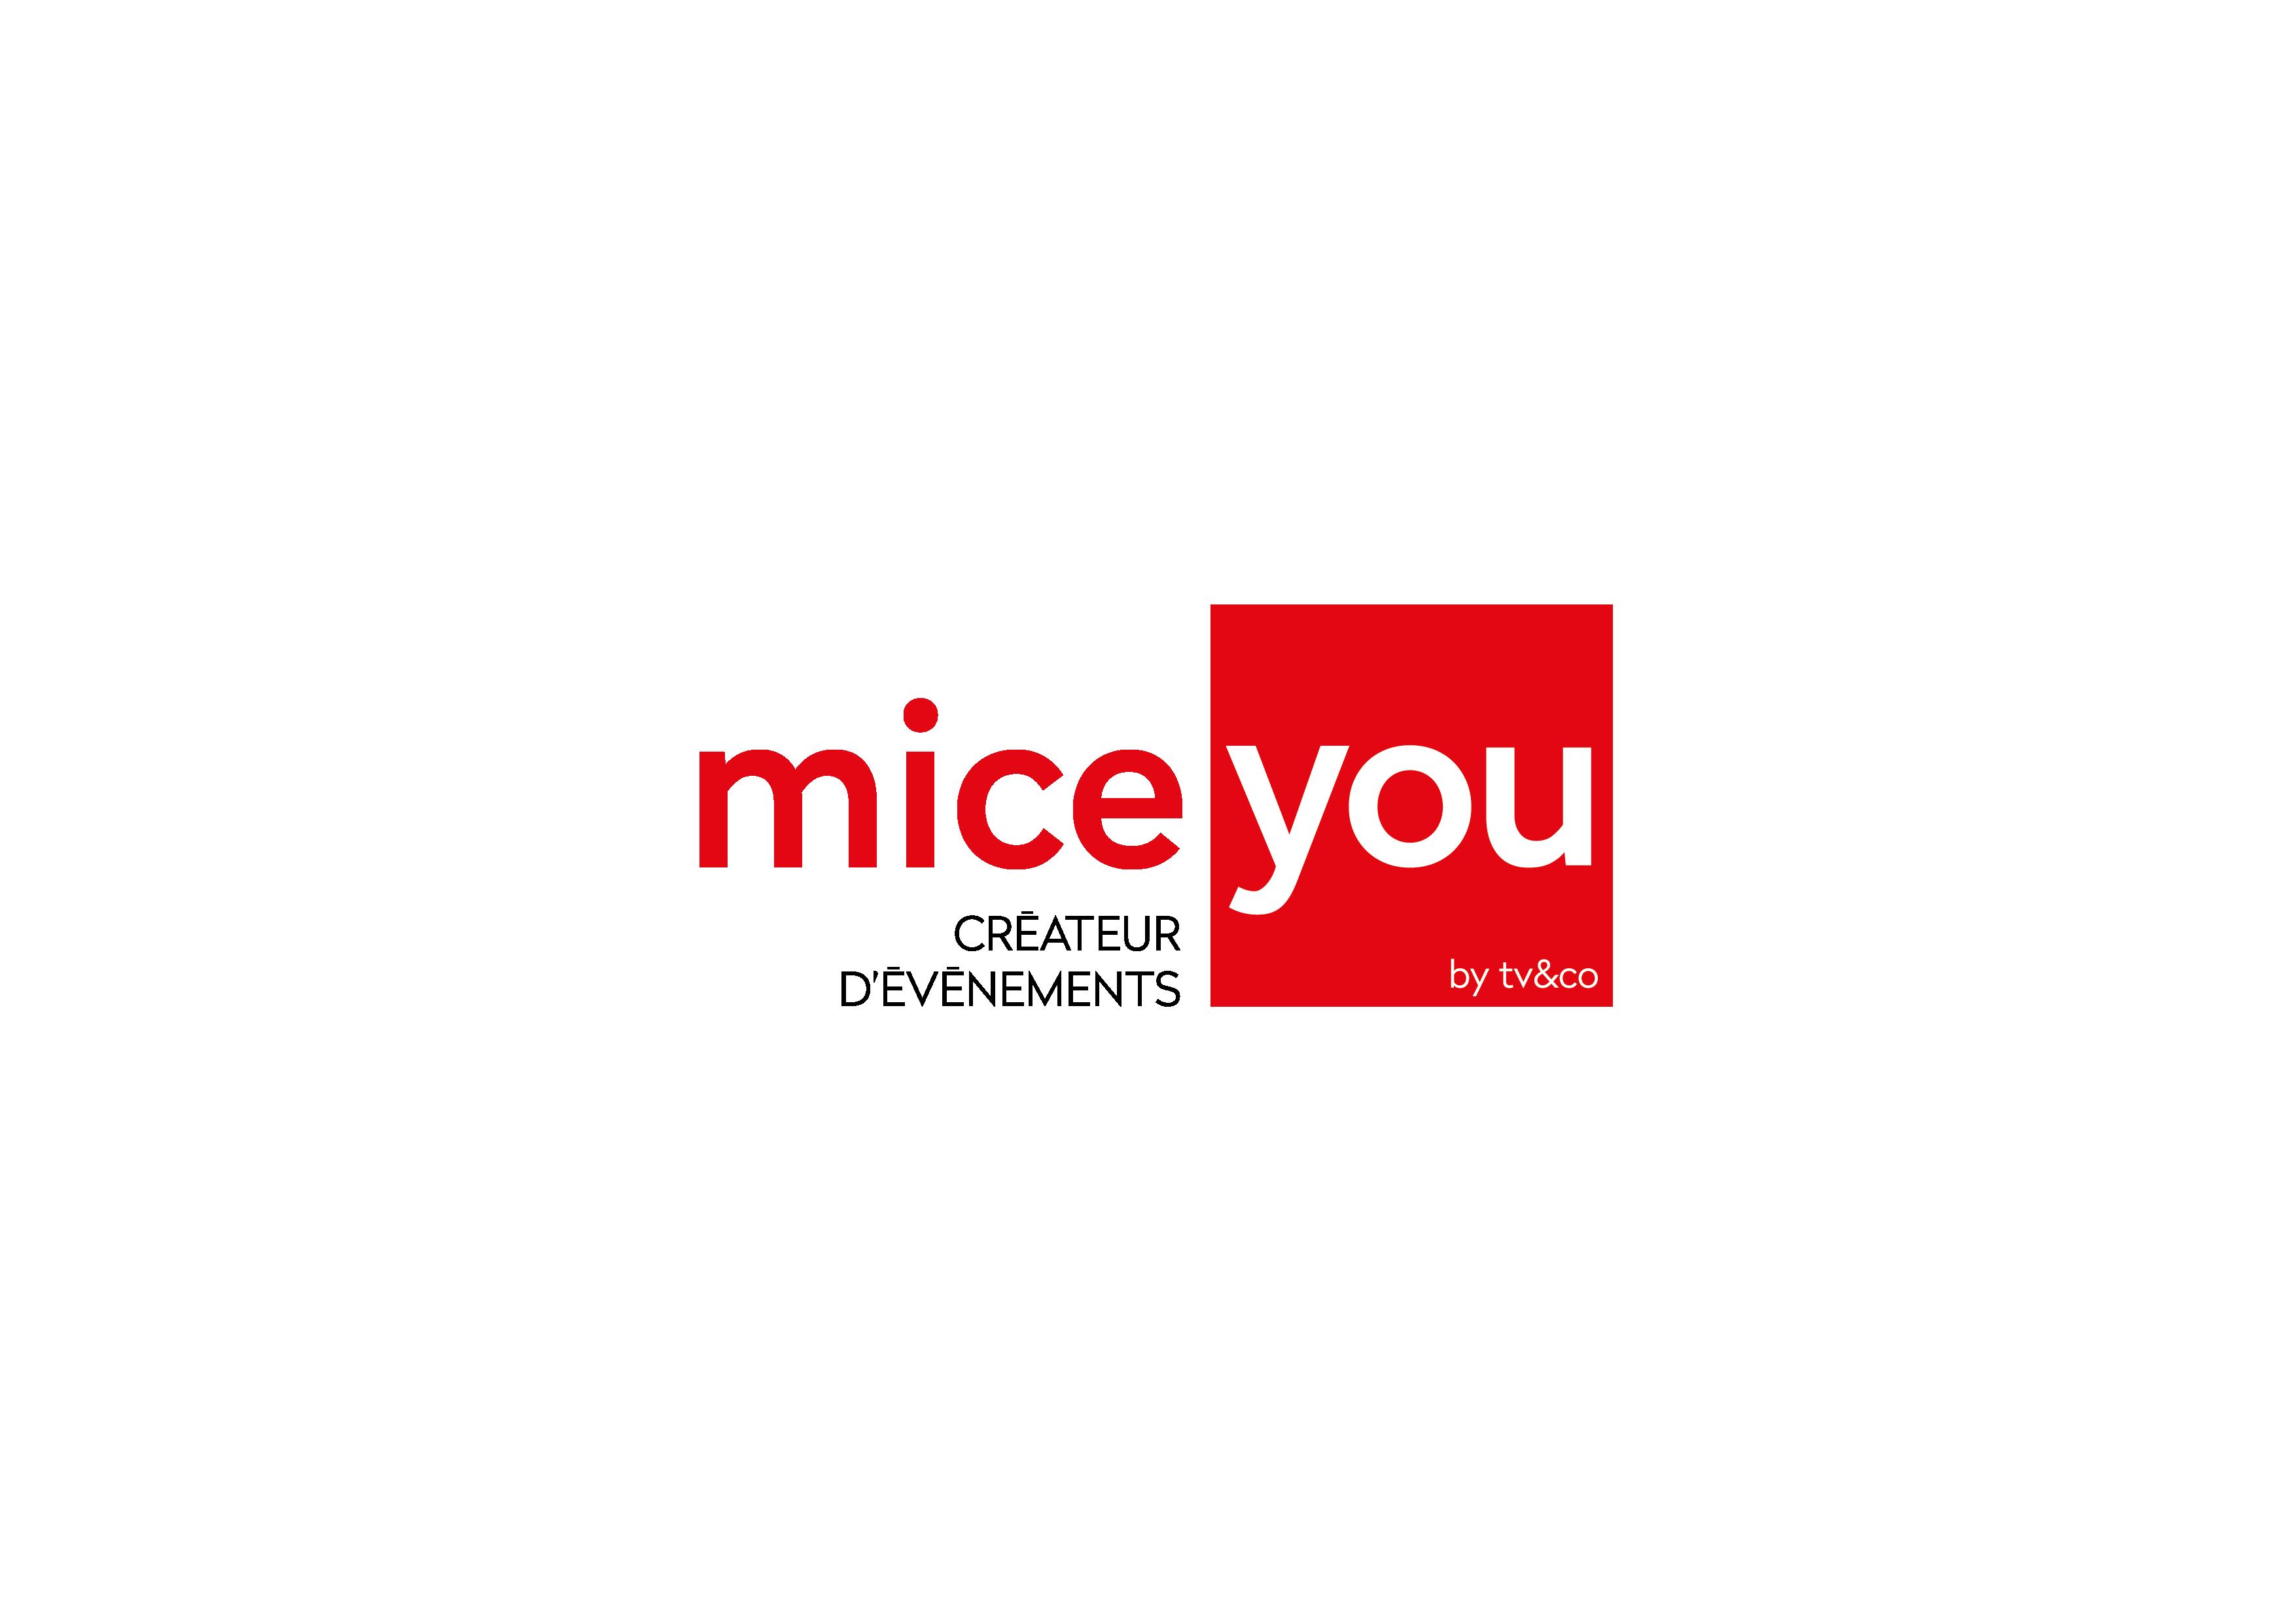 MICE YOU